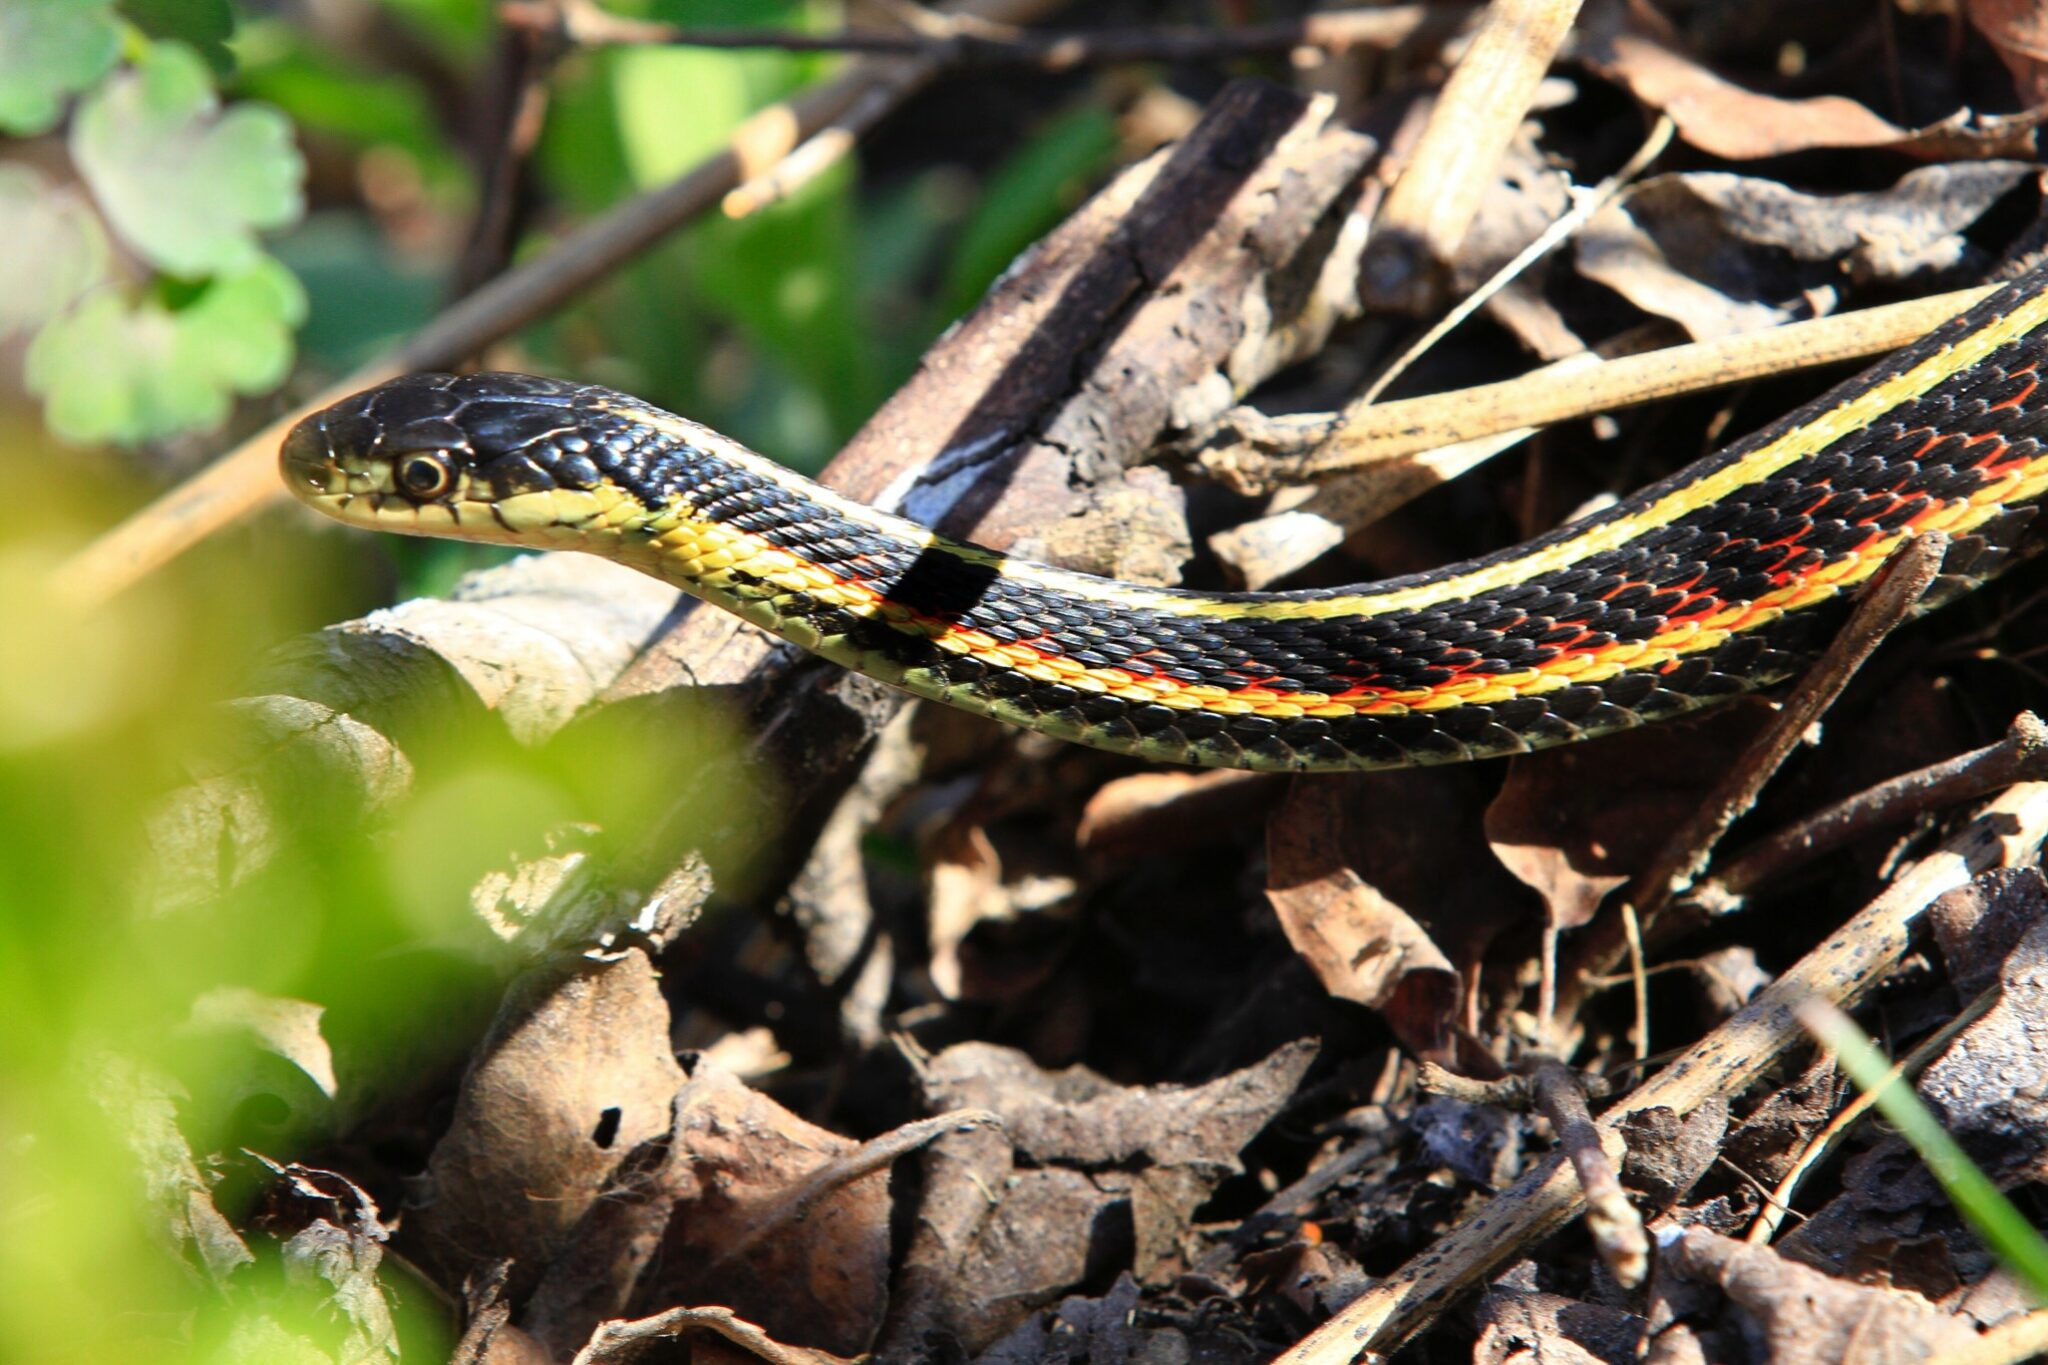 identifier un serpent jarretière